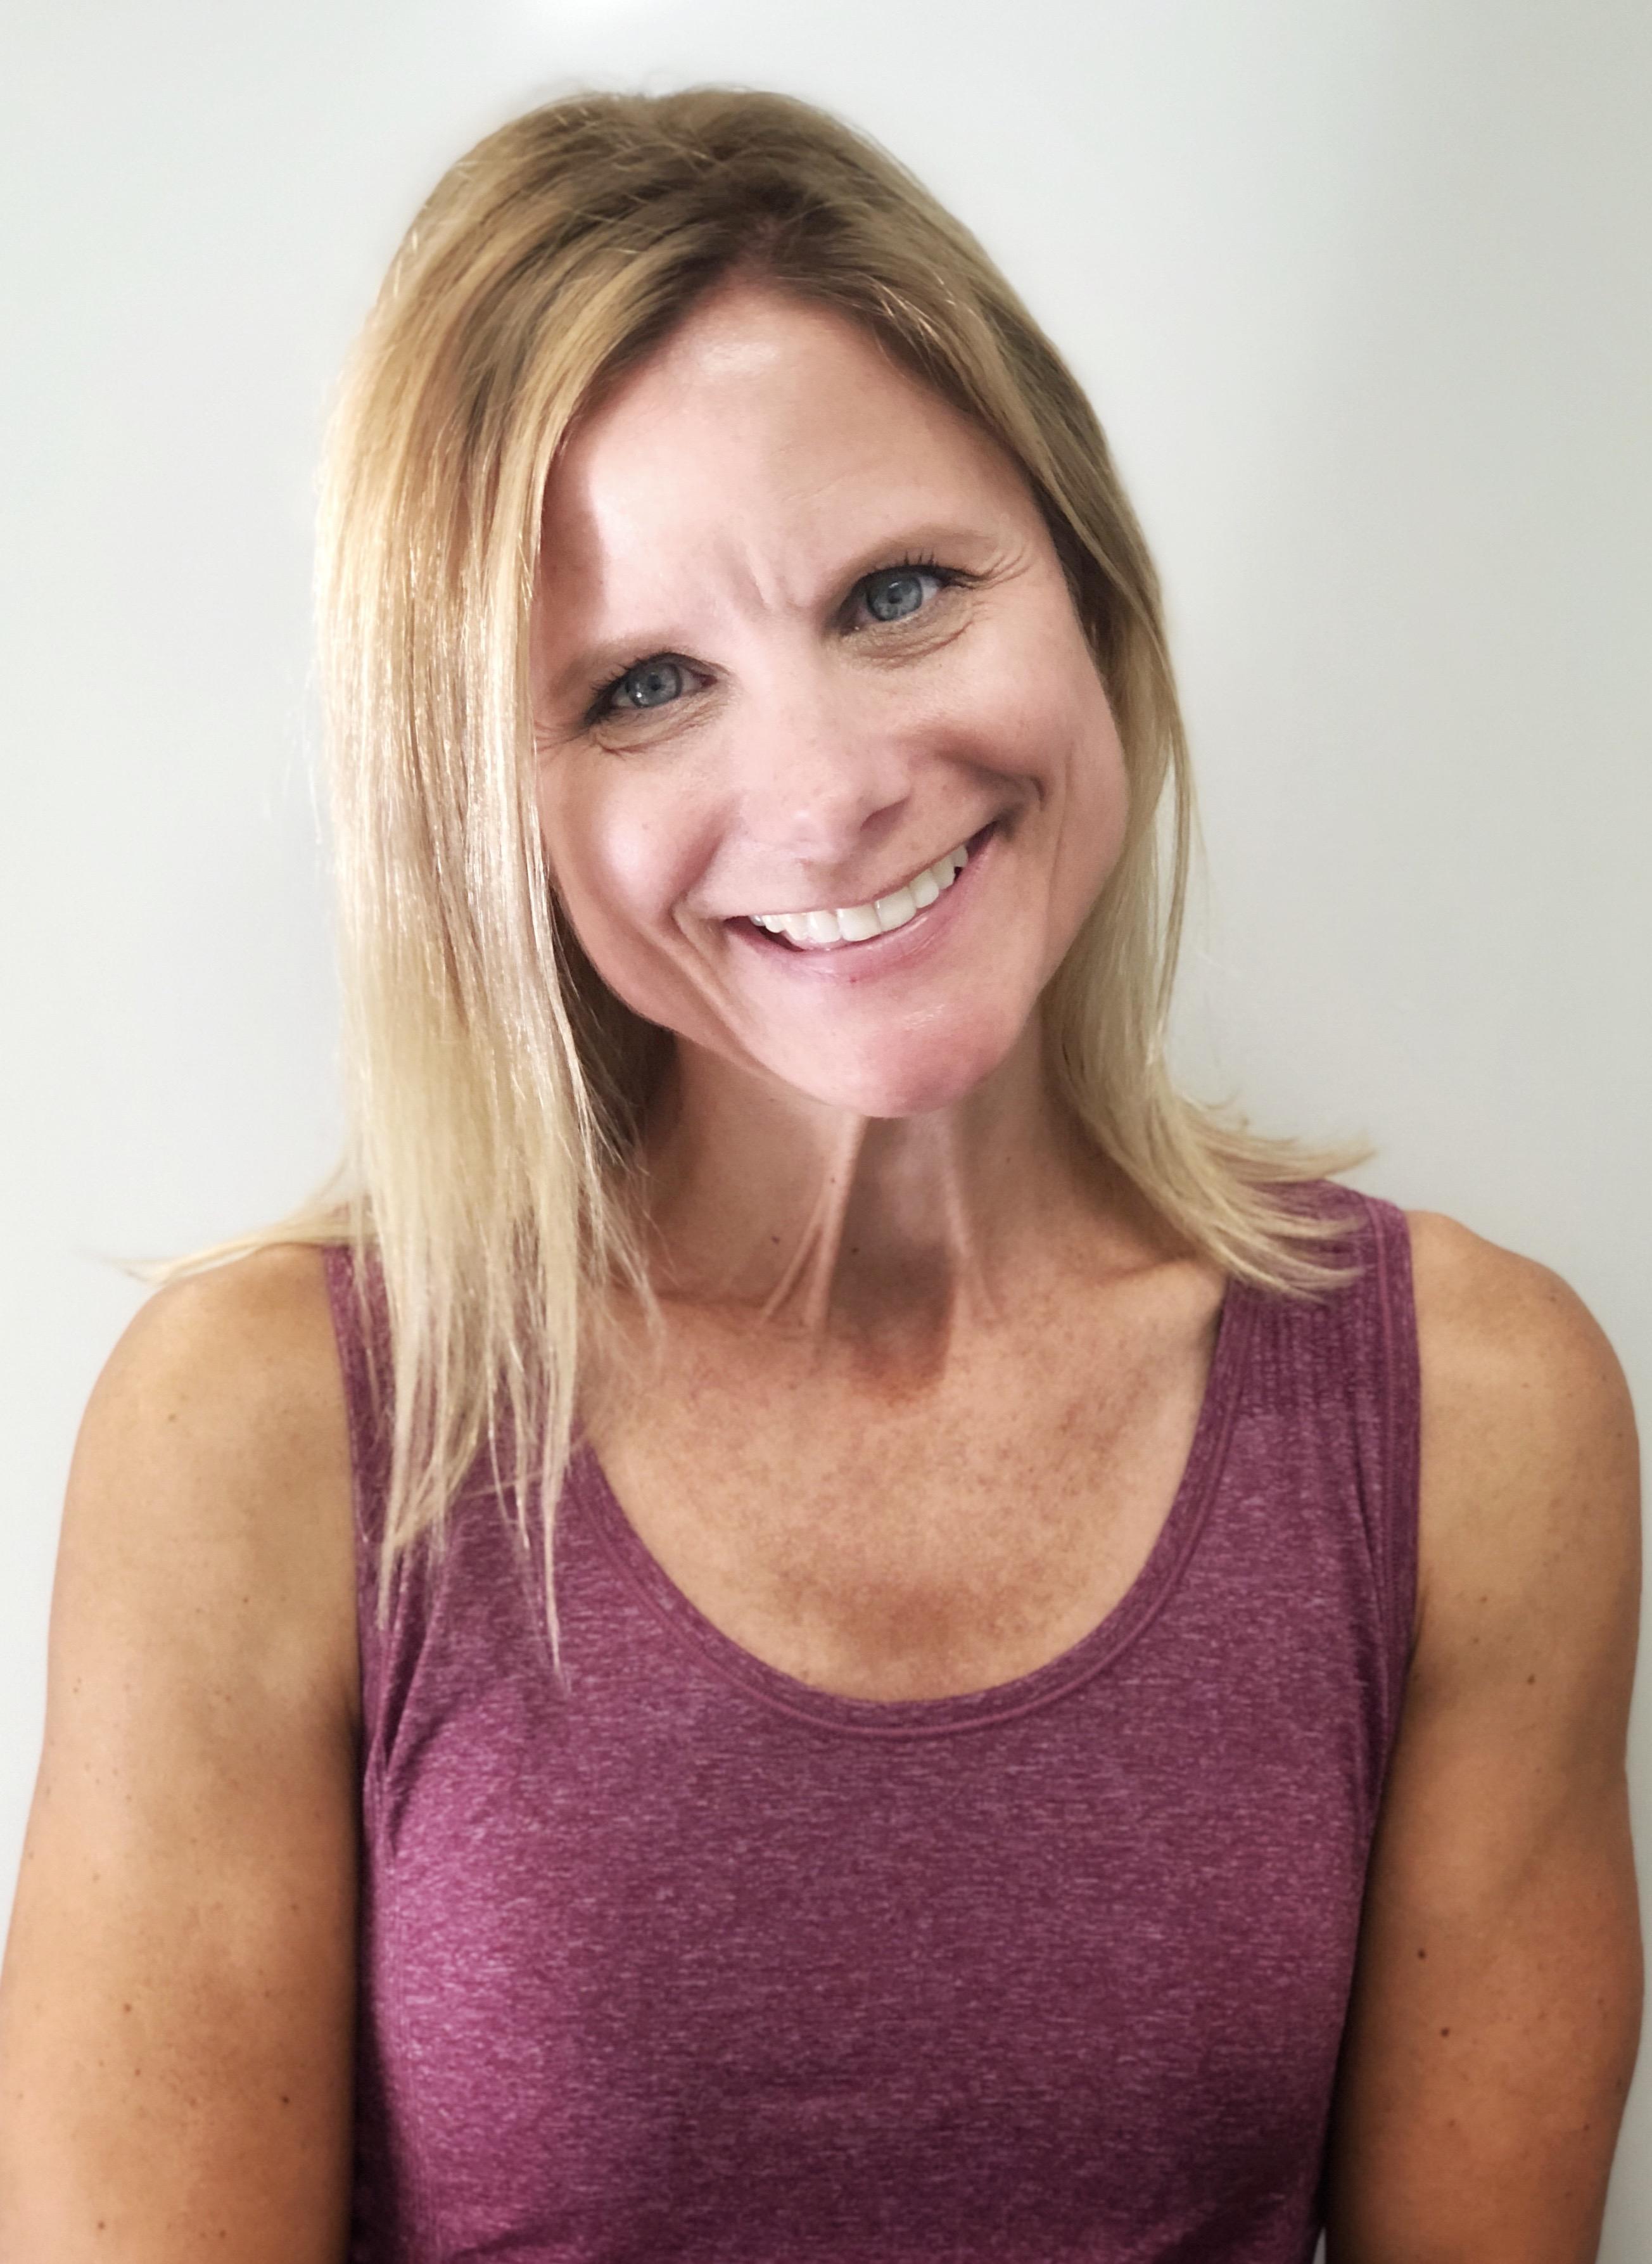 Melissa Penn